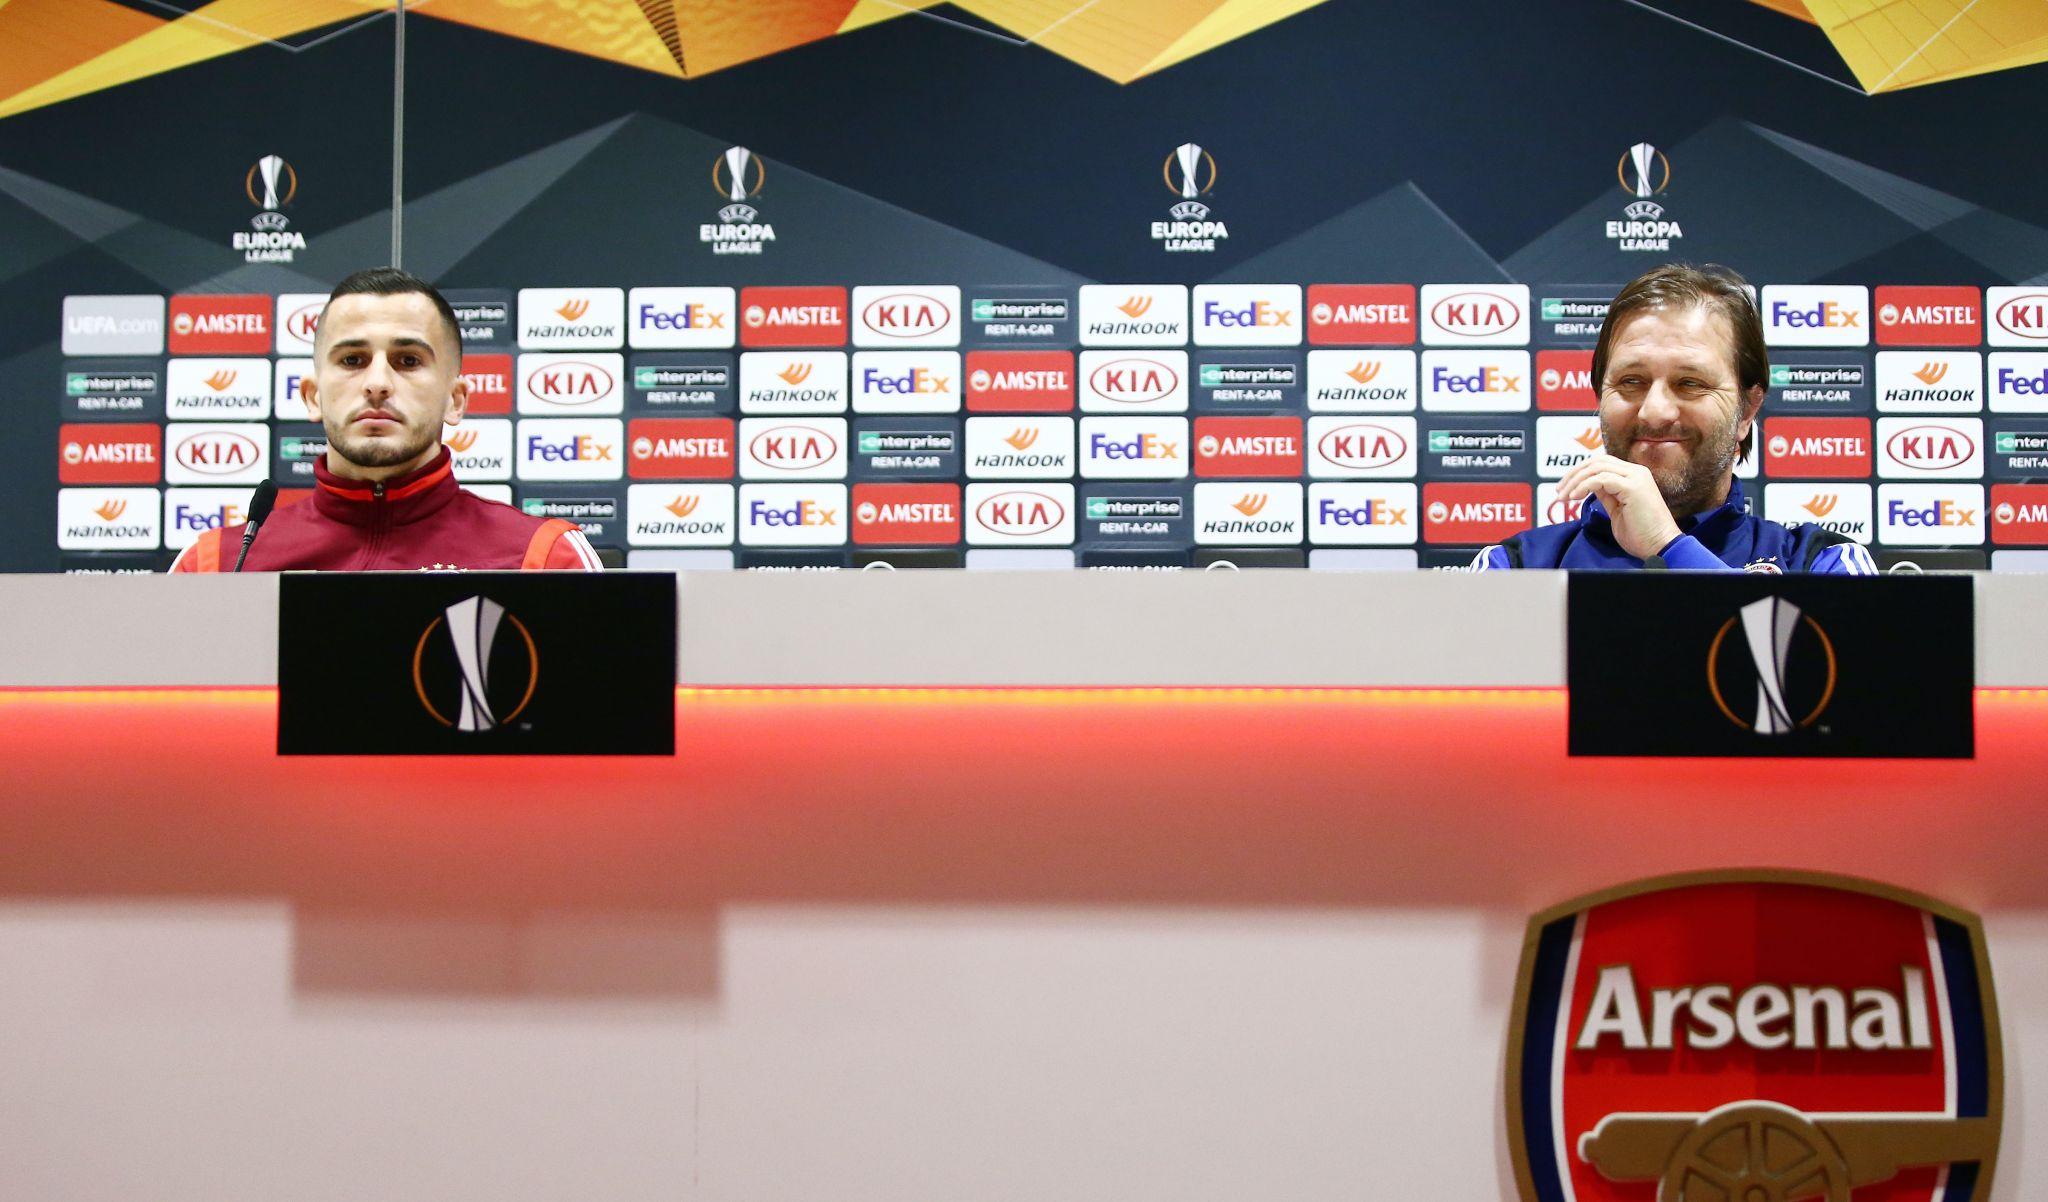 Pre-match press conference by Martins and Elabdellaoui